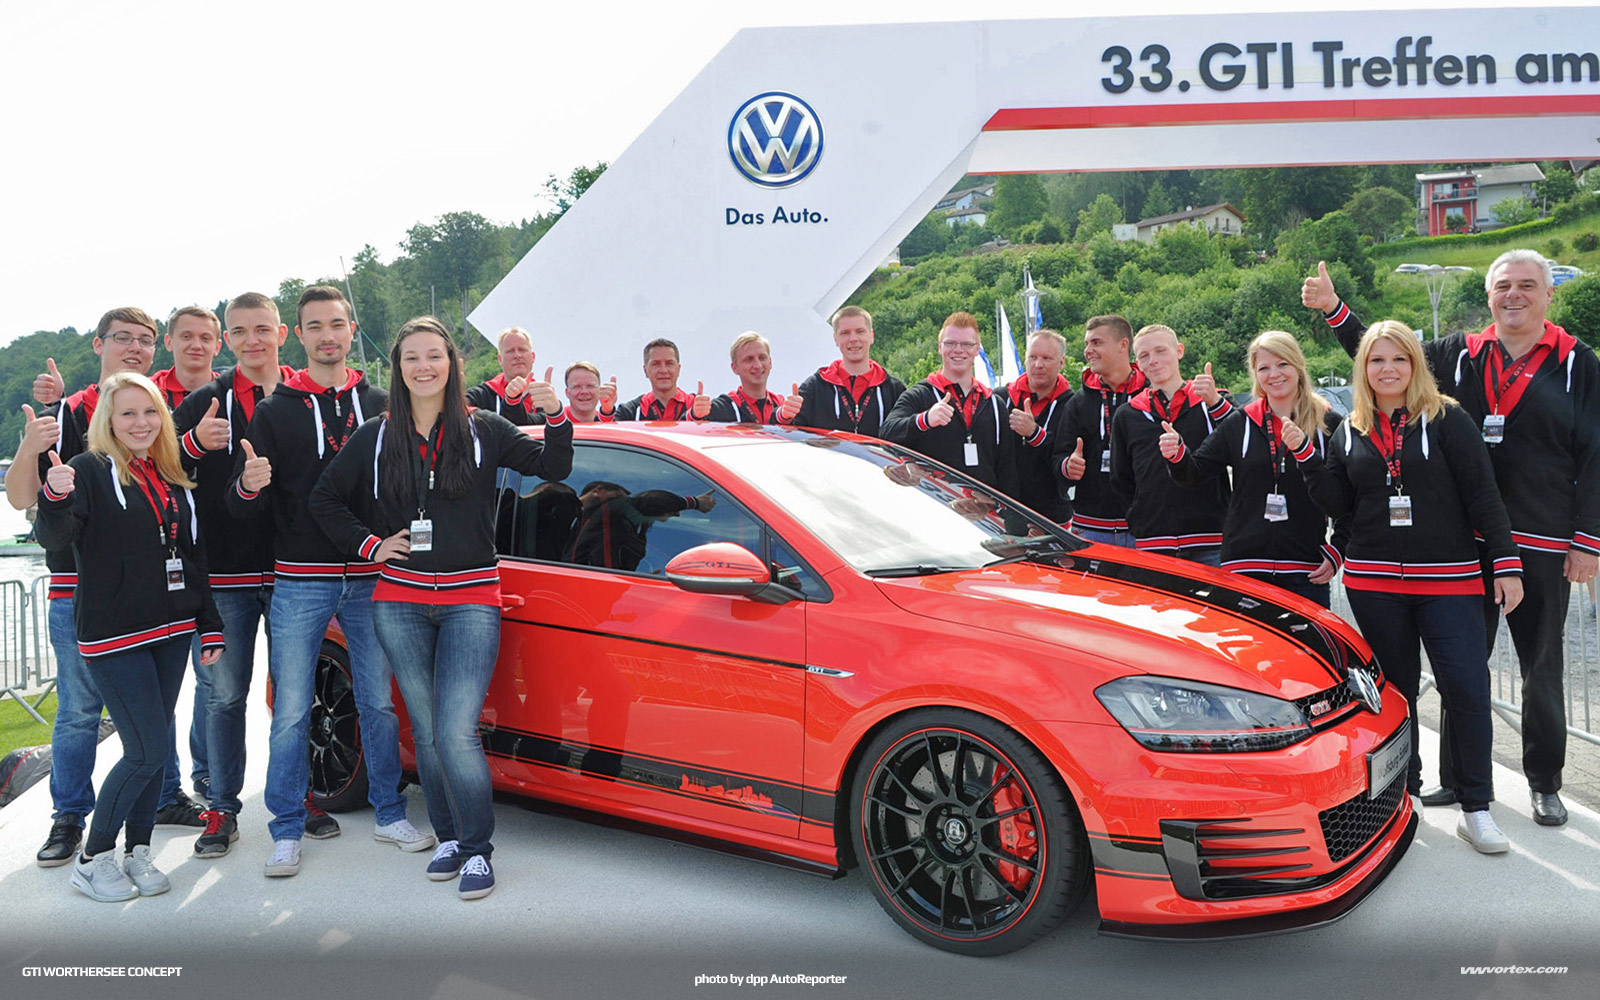 Volkswagen-Worthersee-GTI-concept-363